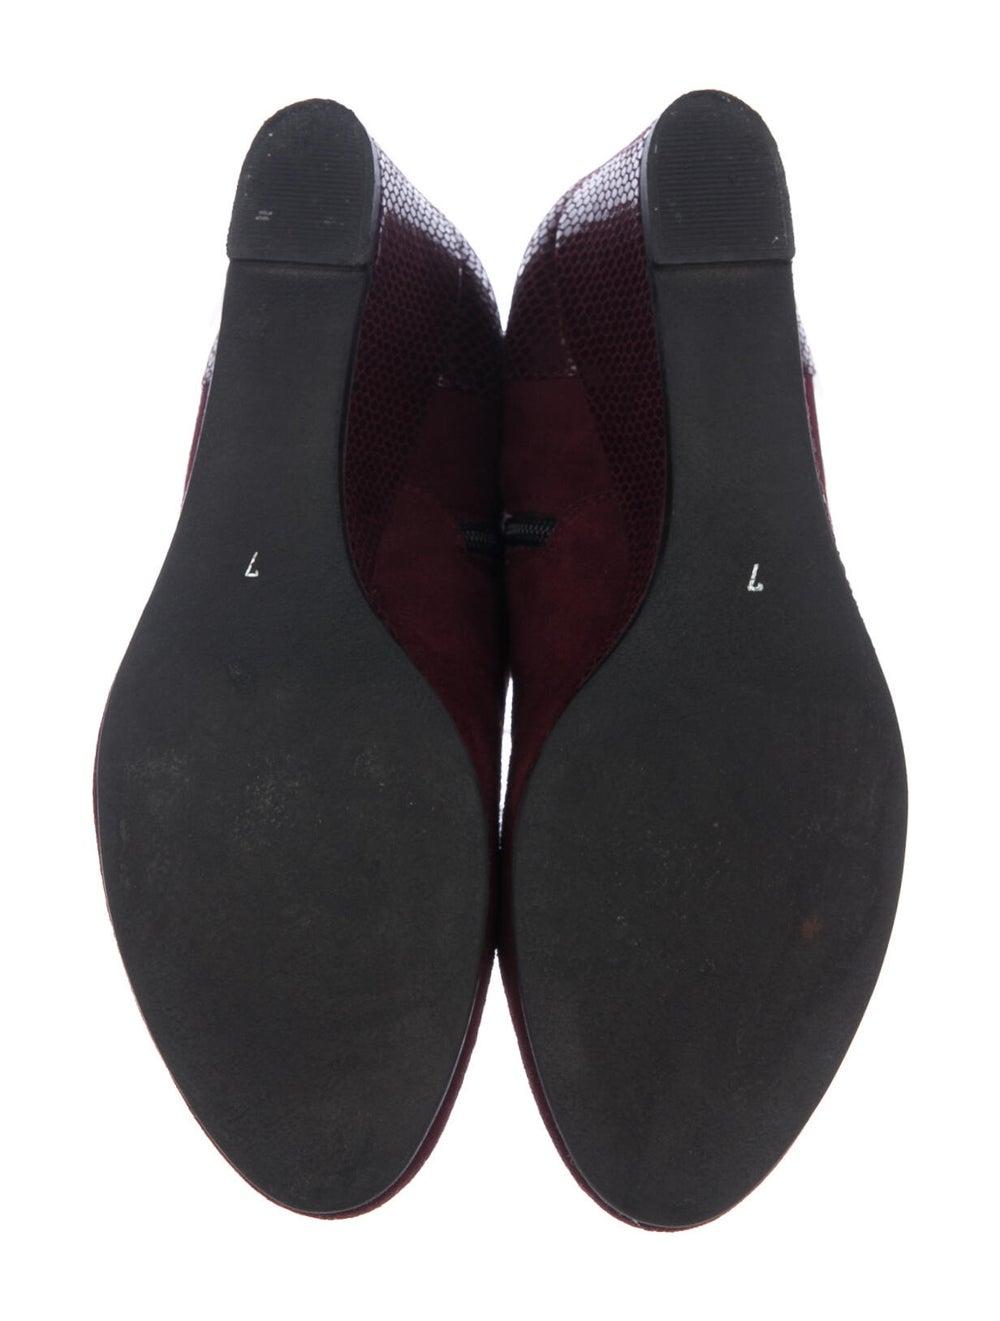 Aquatalia Embossed Suede Boots Red - image 4